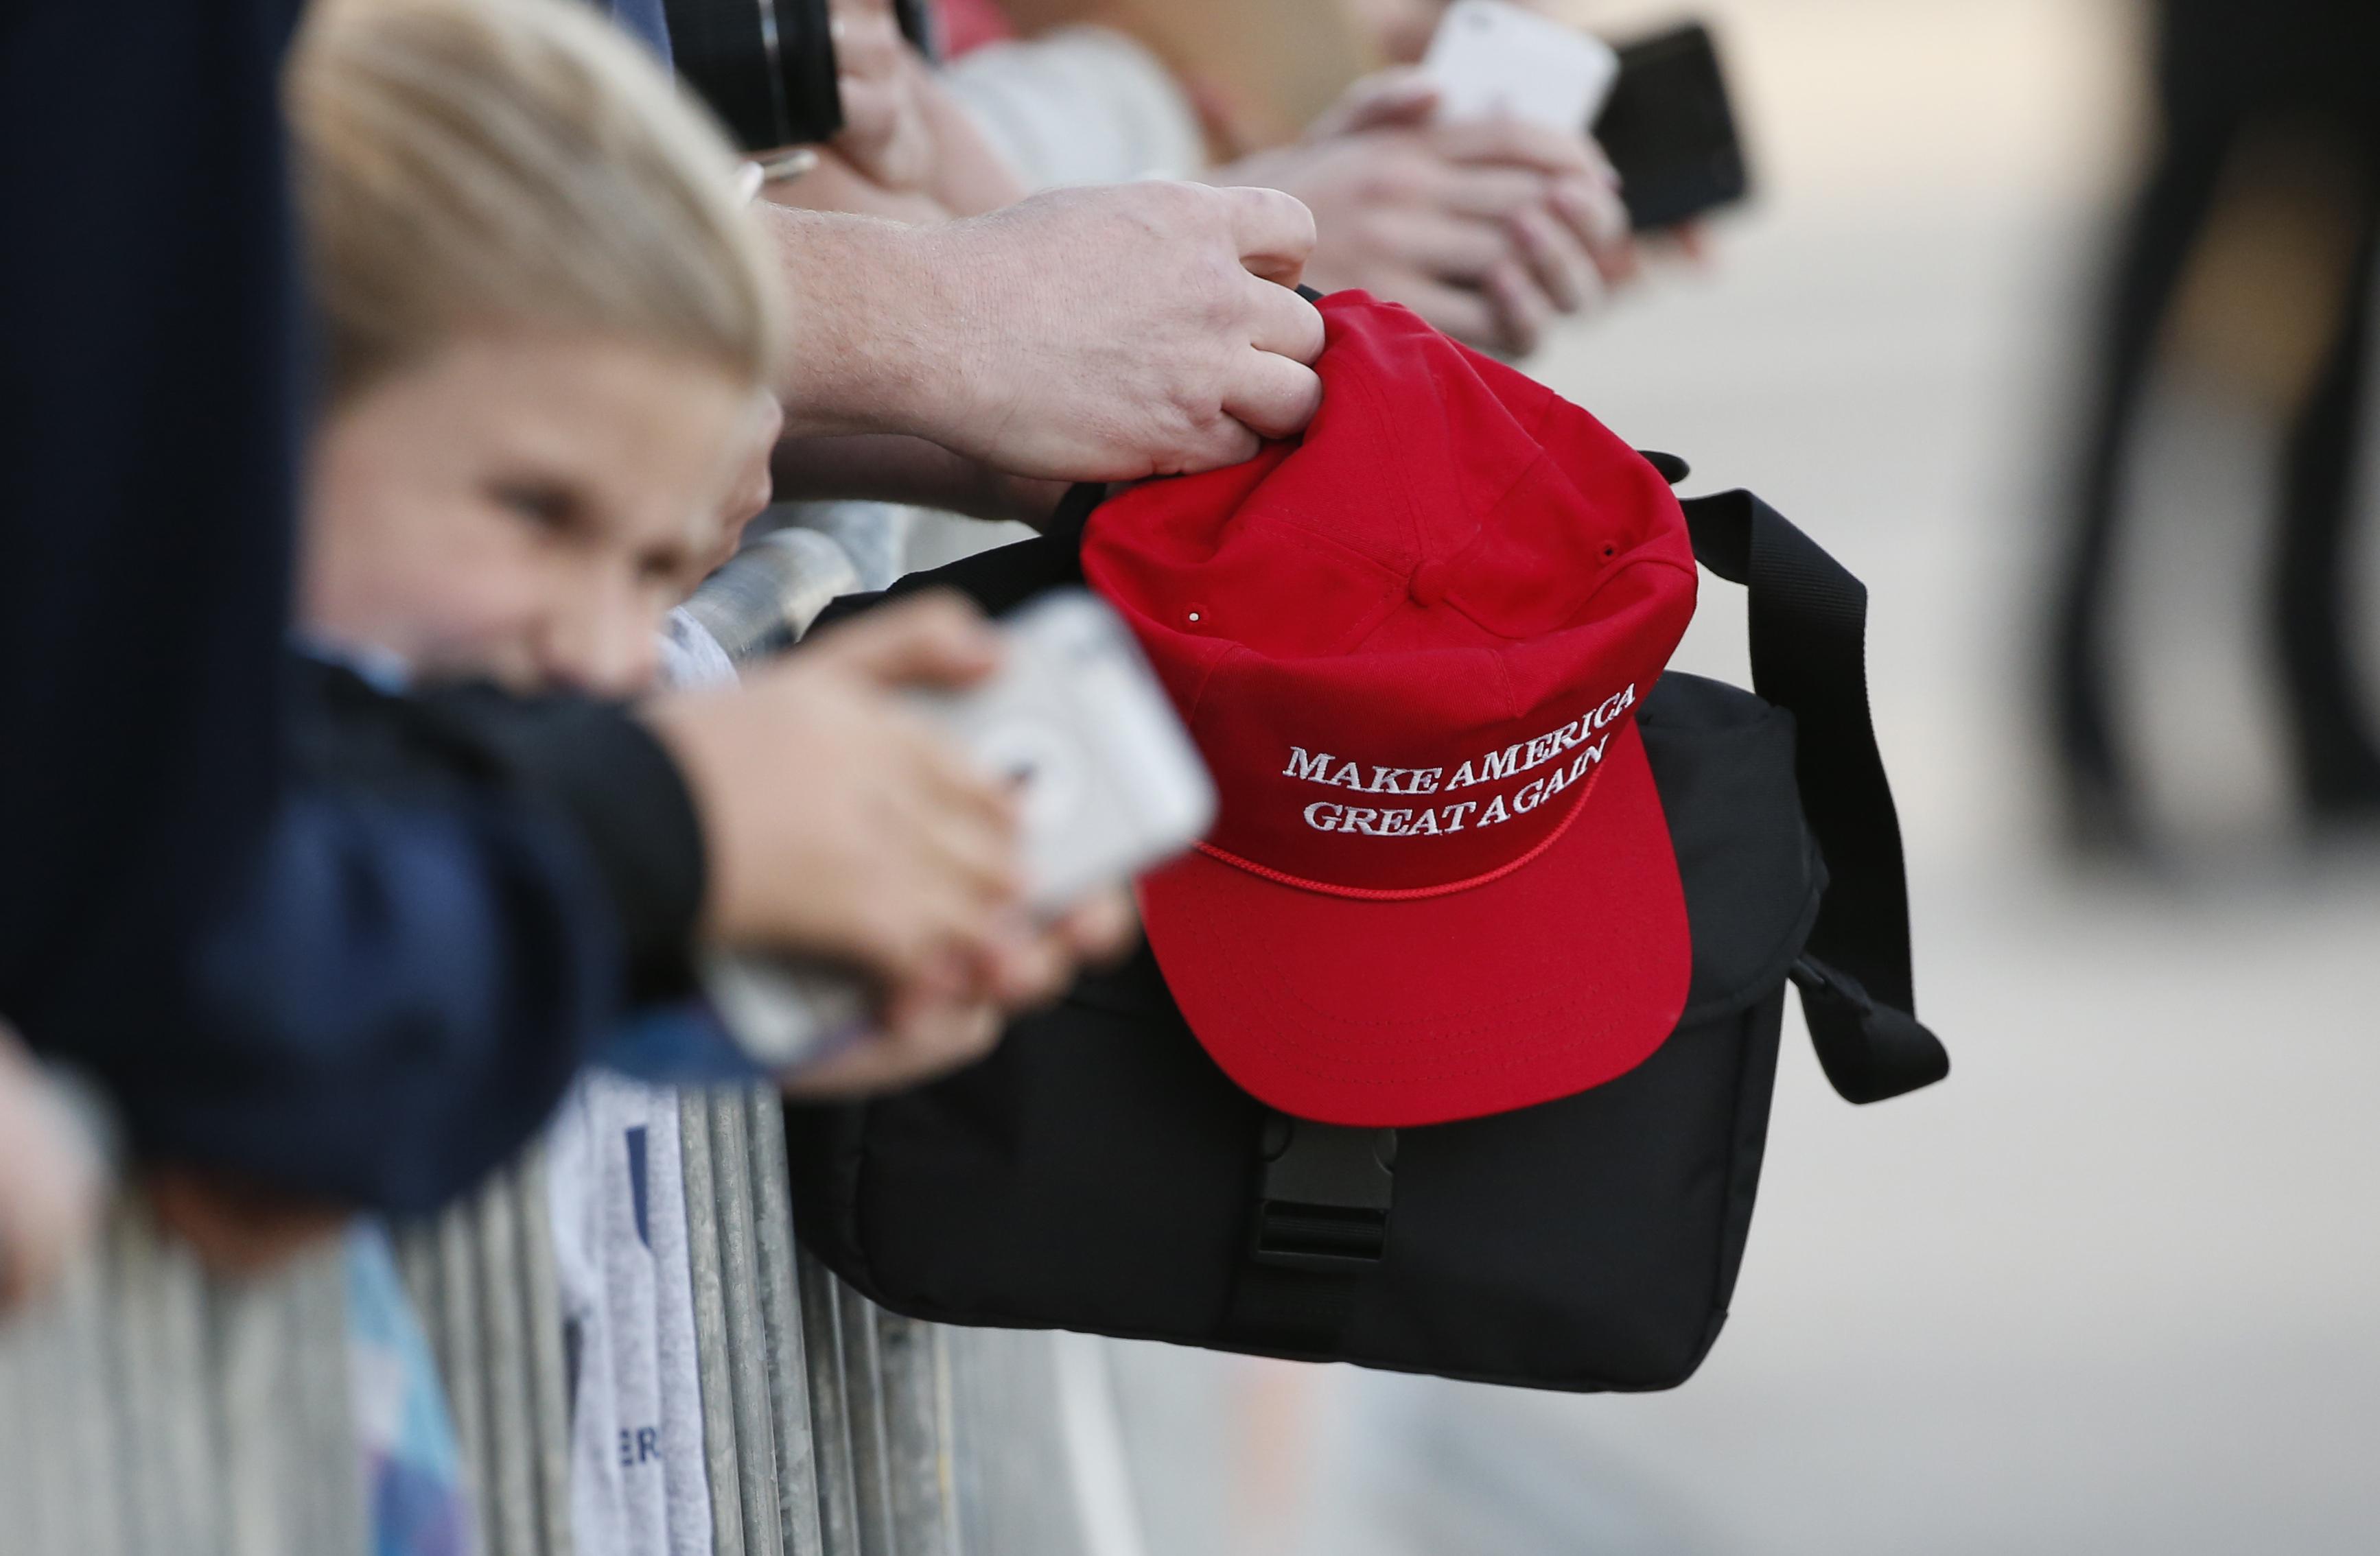 North Korean defectors wearing MAGA hats harassed in D.C.